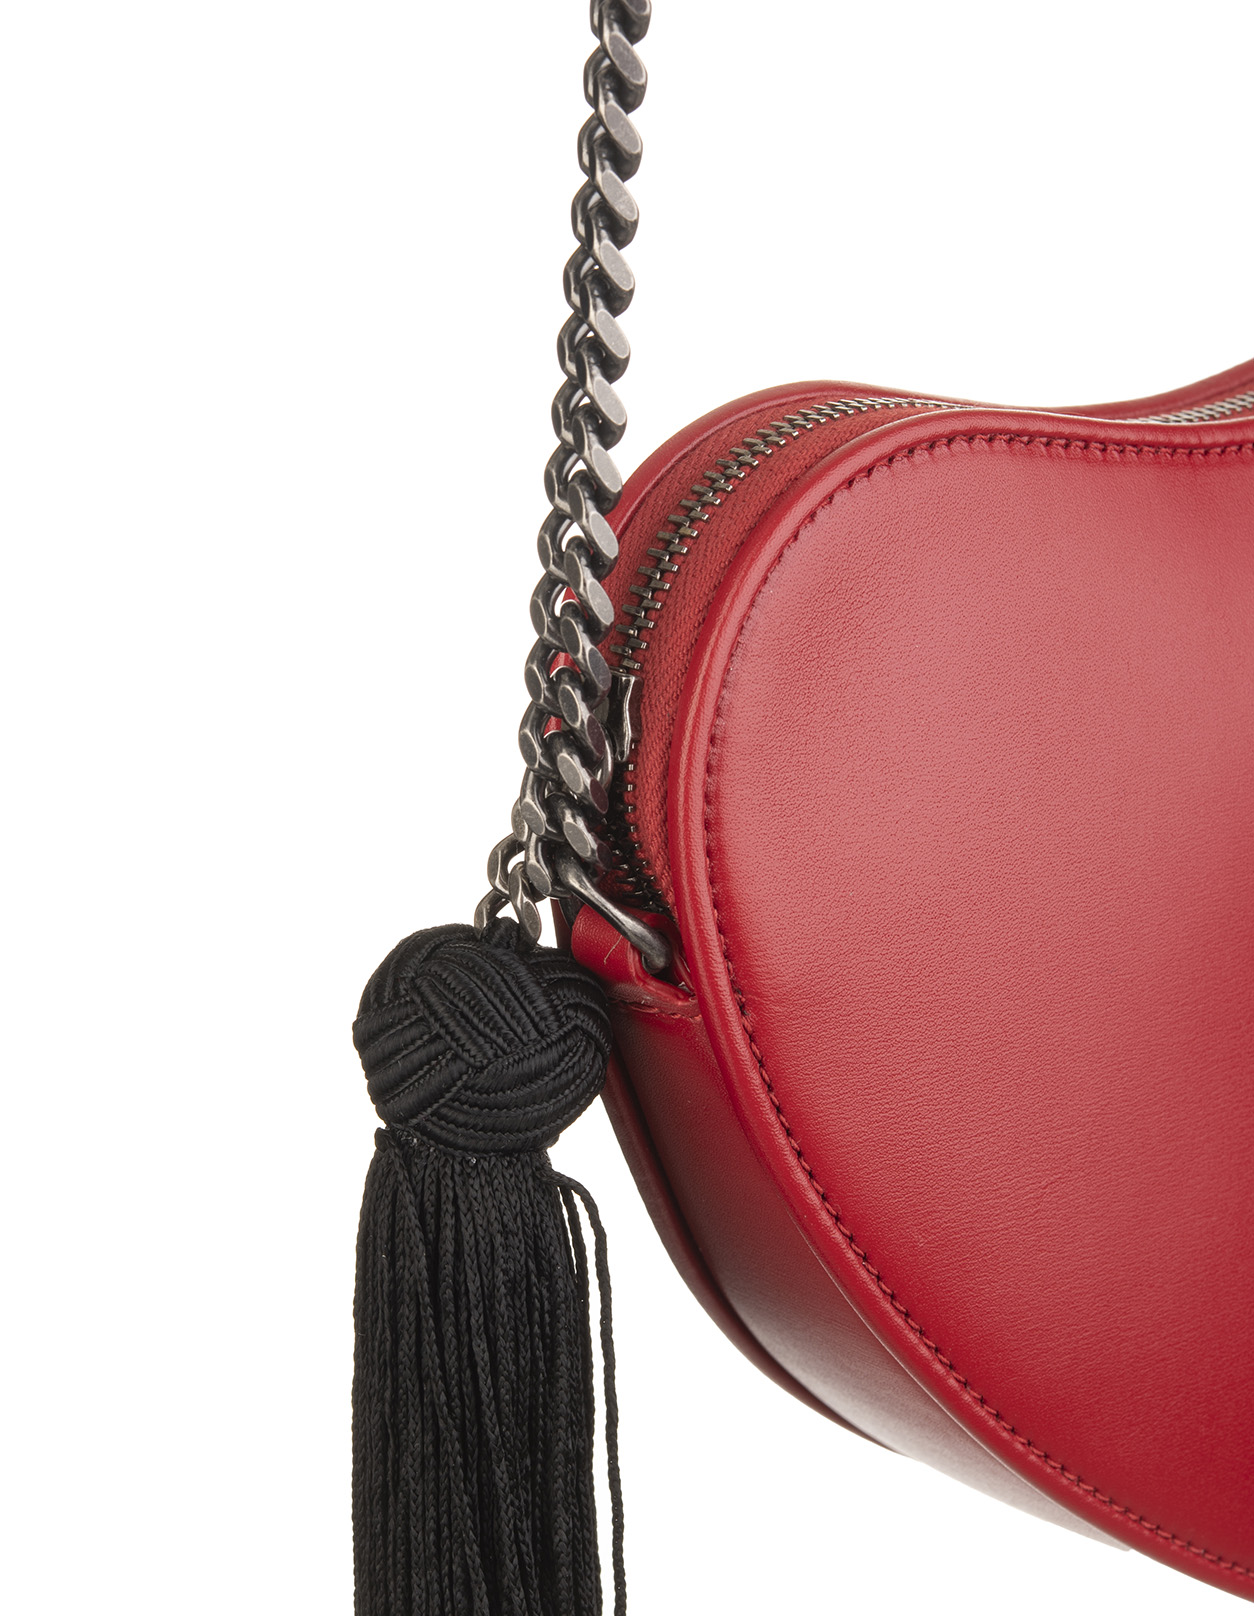 f54456240 Heart Monogram Bag with CrossBelt Red - SAINT LAURENT - Russocapri